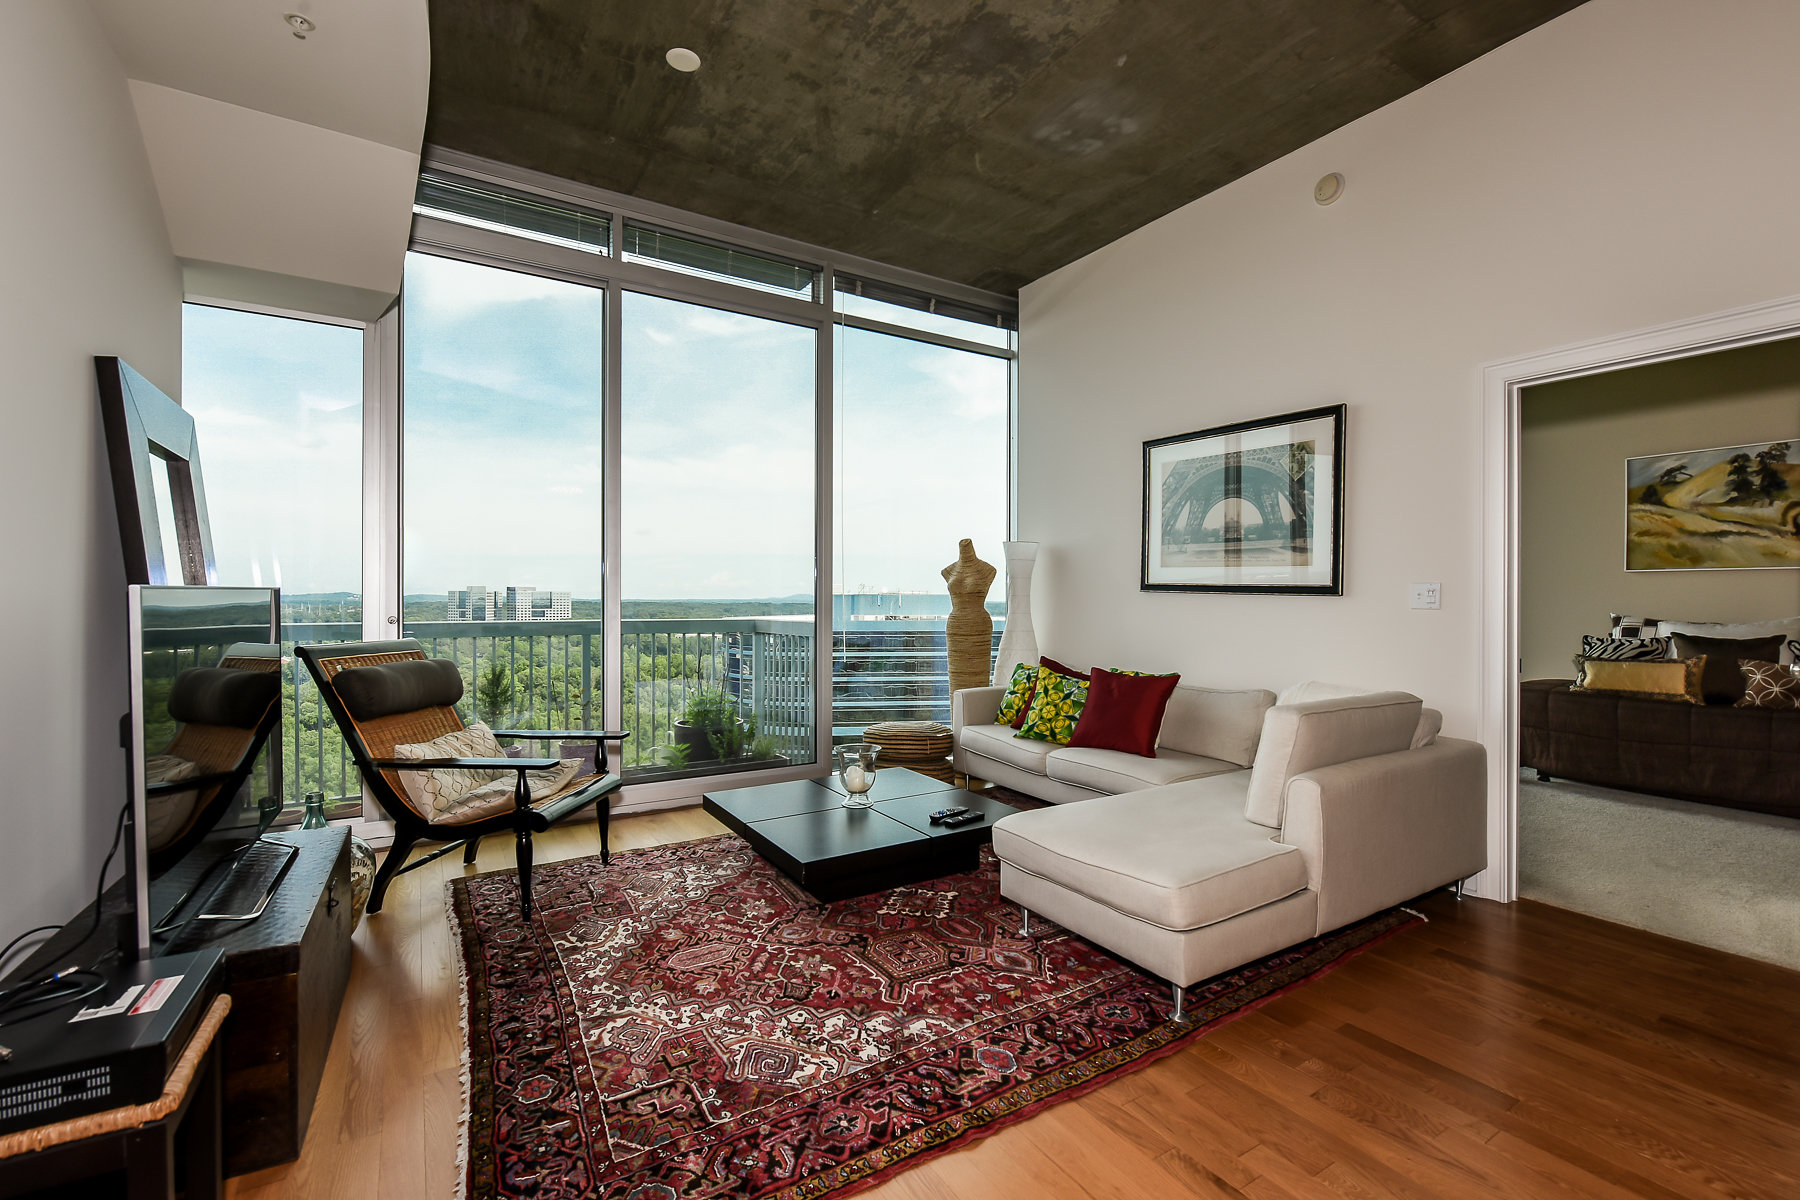 Single Family Home for Sale at HORIZON 3300 Windy Ridge Parkway 1717 Atlanta, Georgia 30339 United States